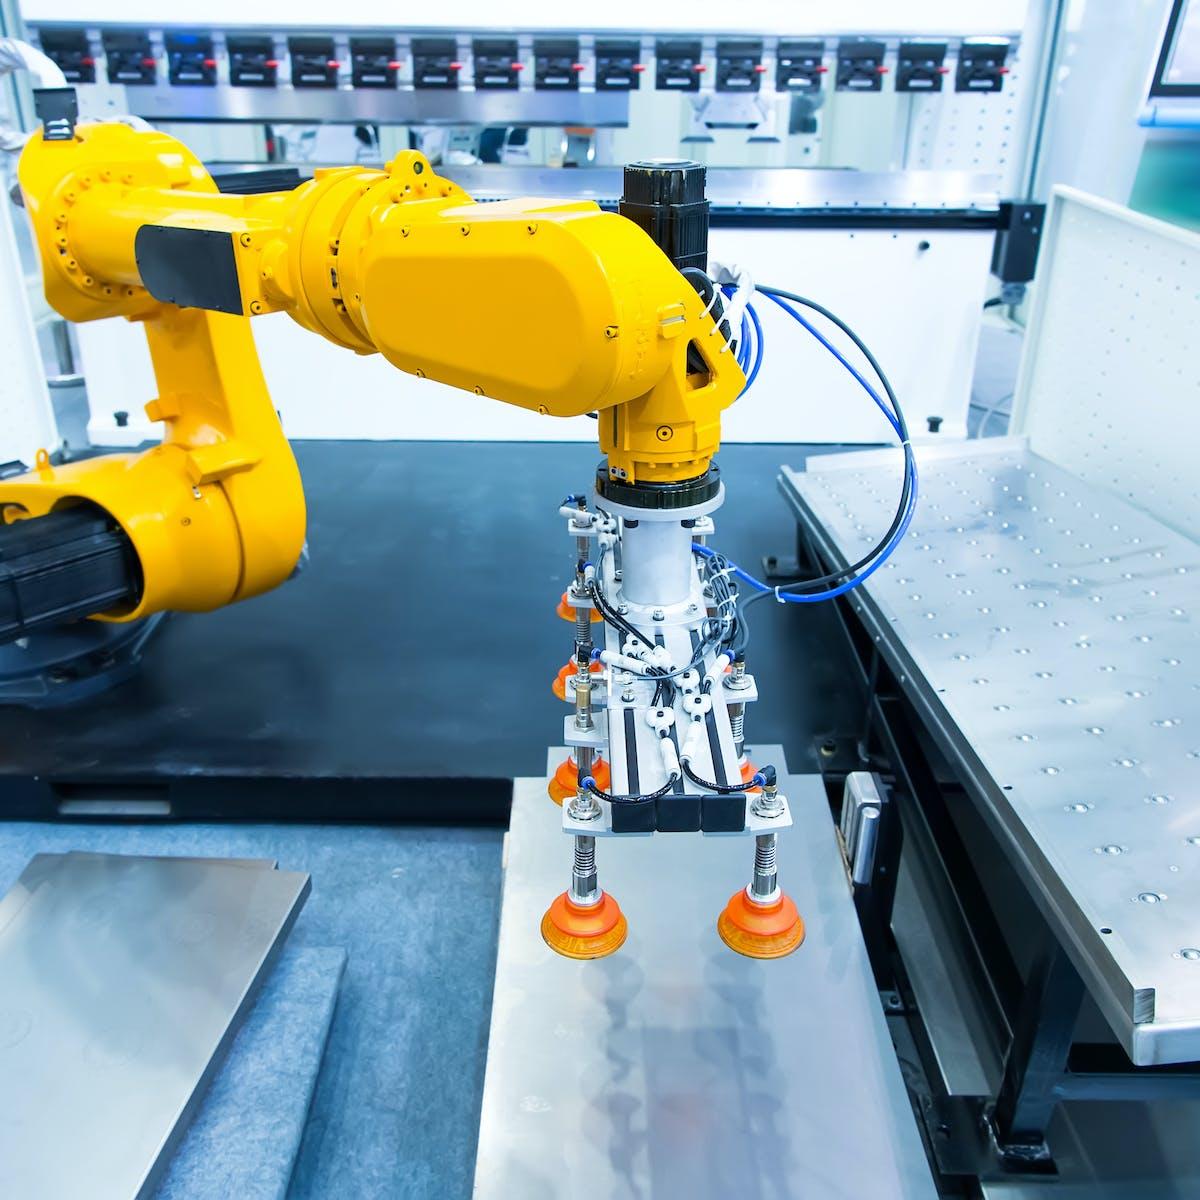 Titelbild-Smart-Factory-Roboter-Roboterarm-Produktion-Fabrik-Industrie-4-0-AdobeStock-202769372-xiaoliangge